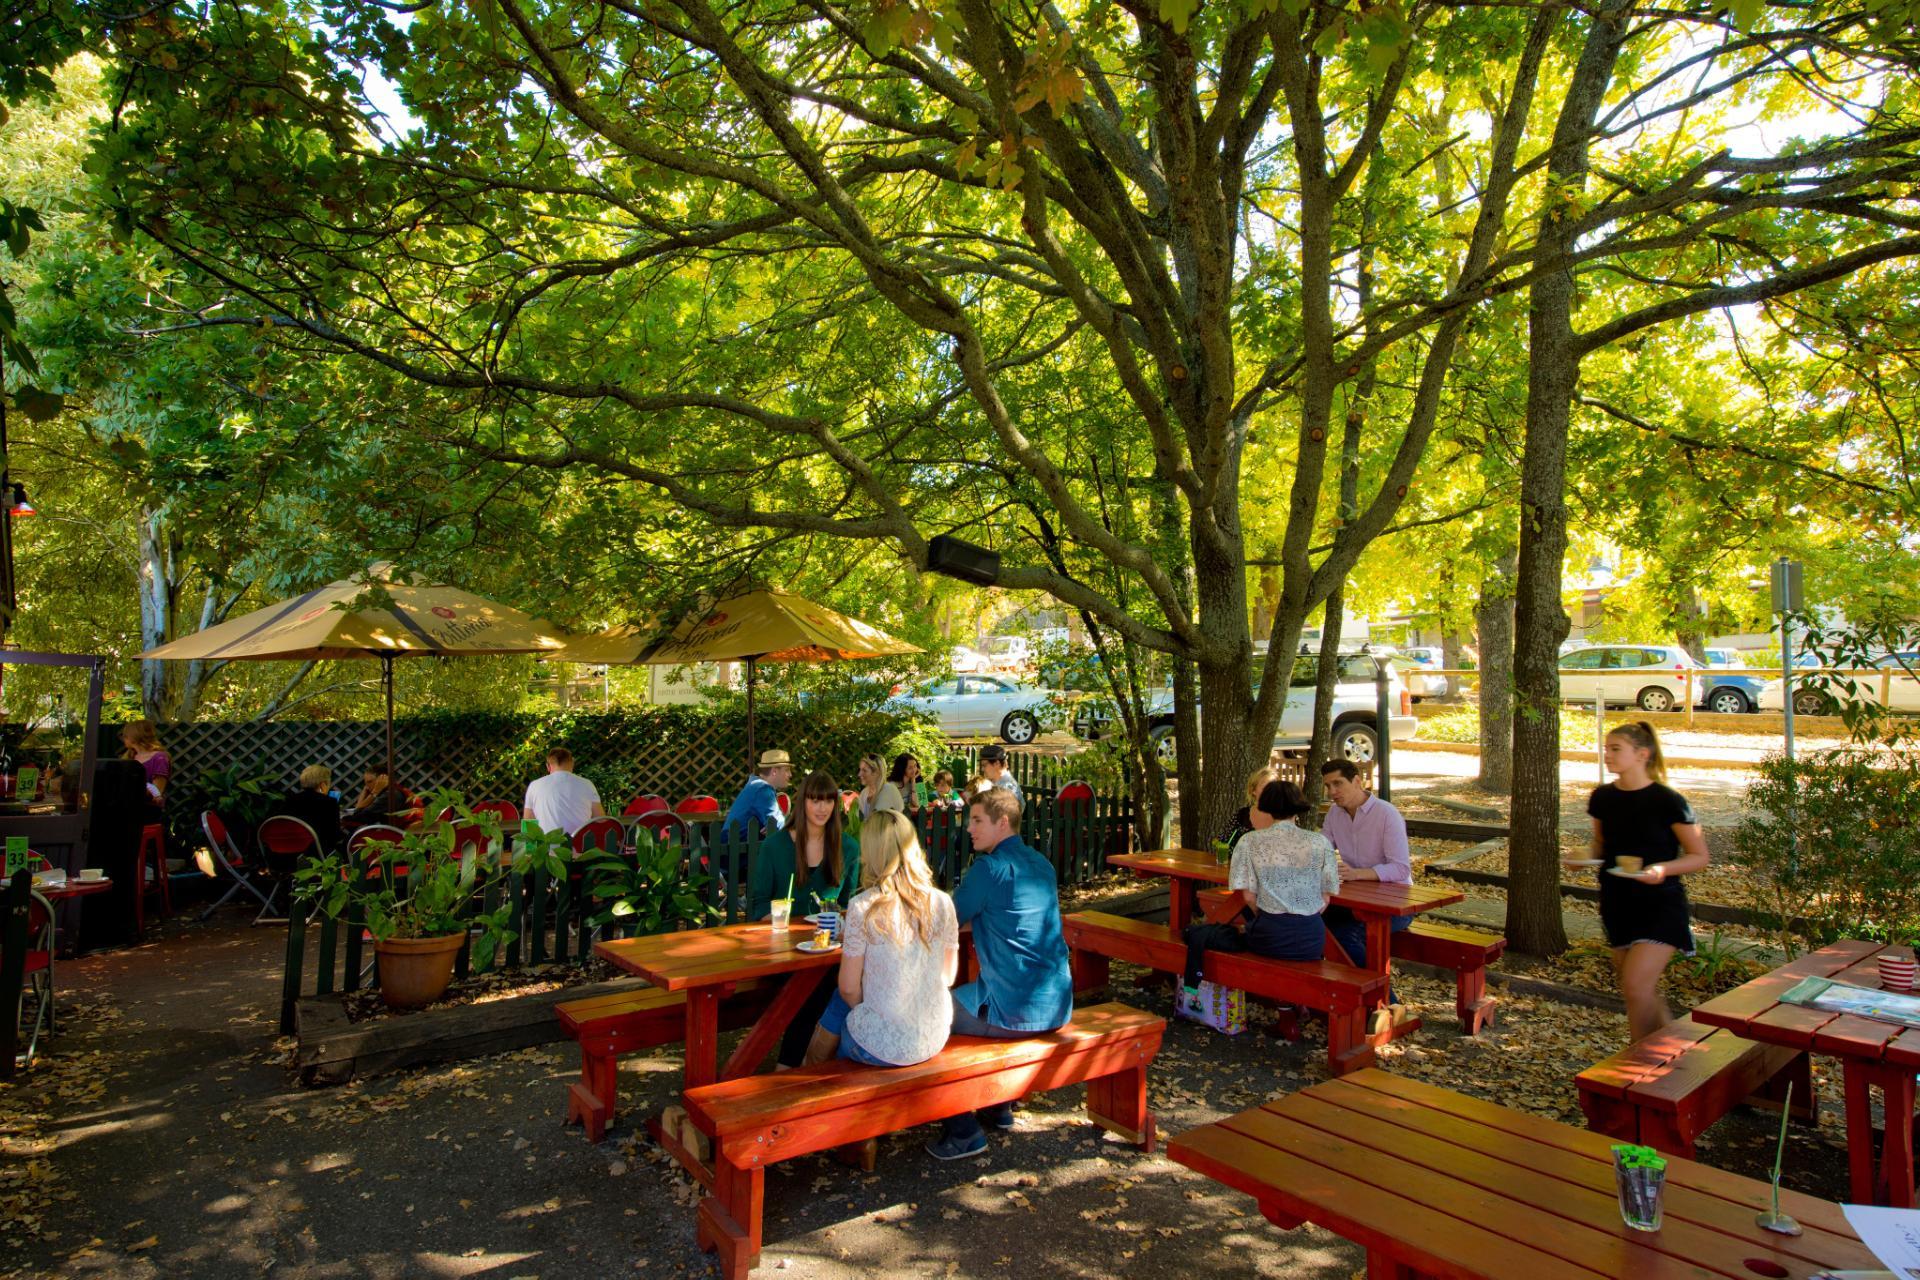 South Australian Tourism Commission/Adam Bruzzone